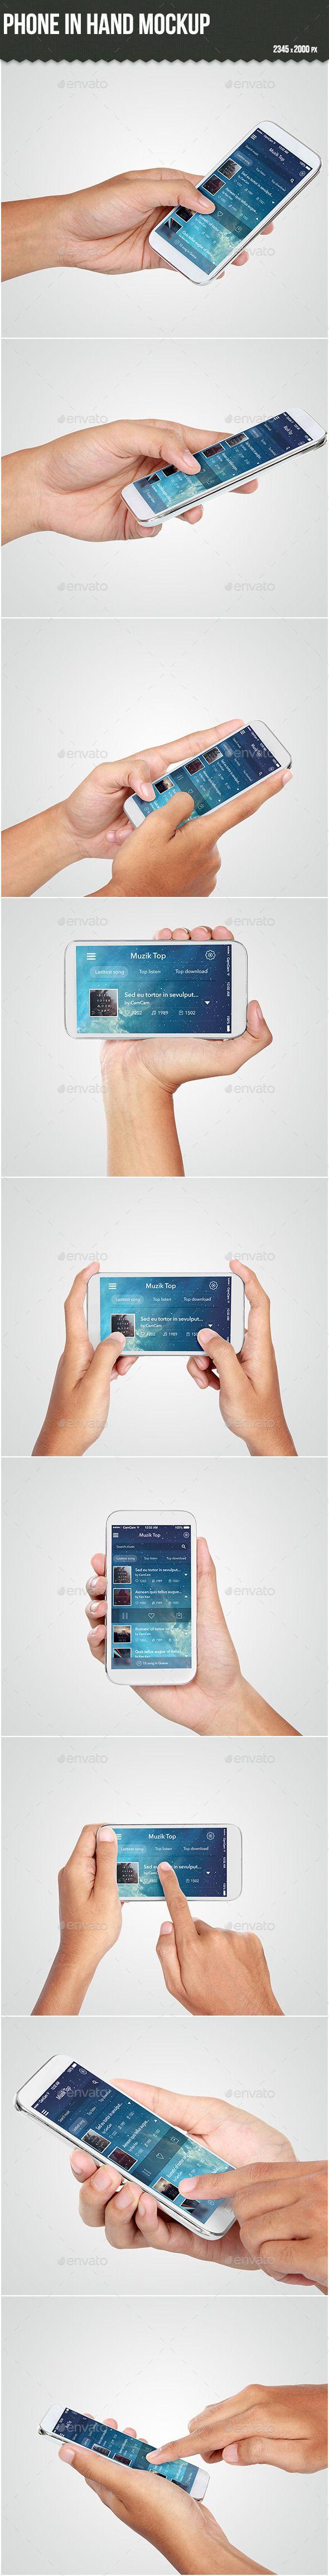 Pin by Bashooka Web & Graphic Design on Mobile Mockup